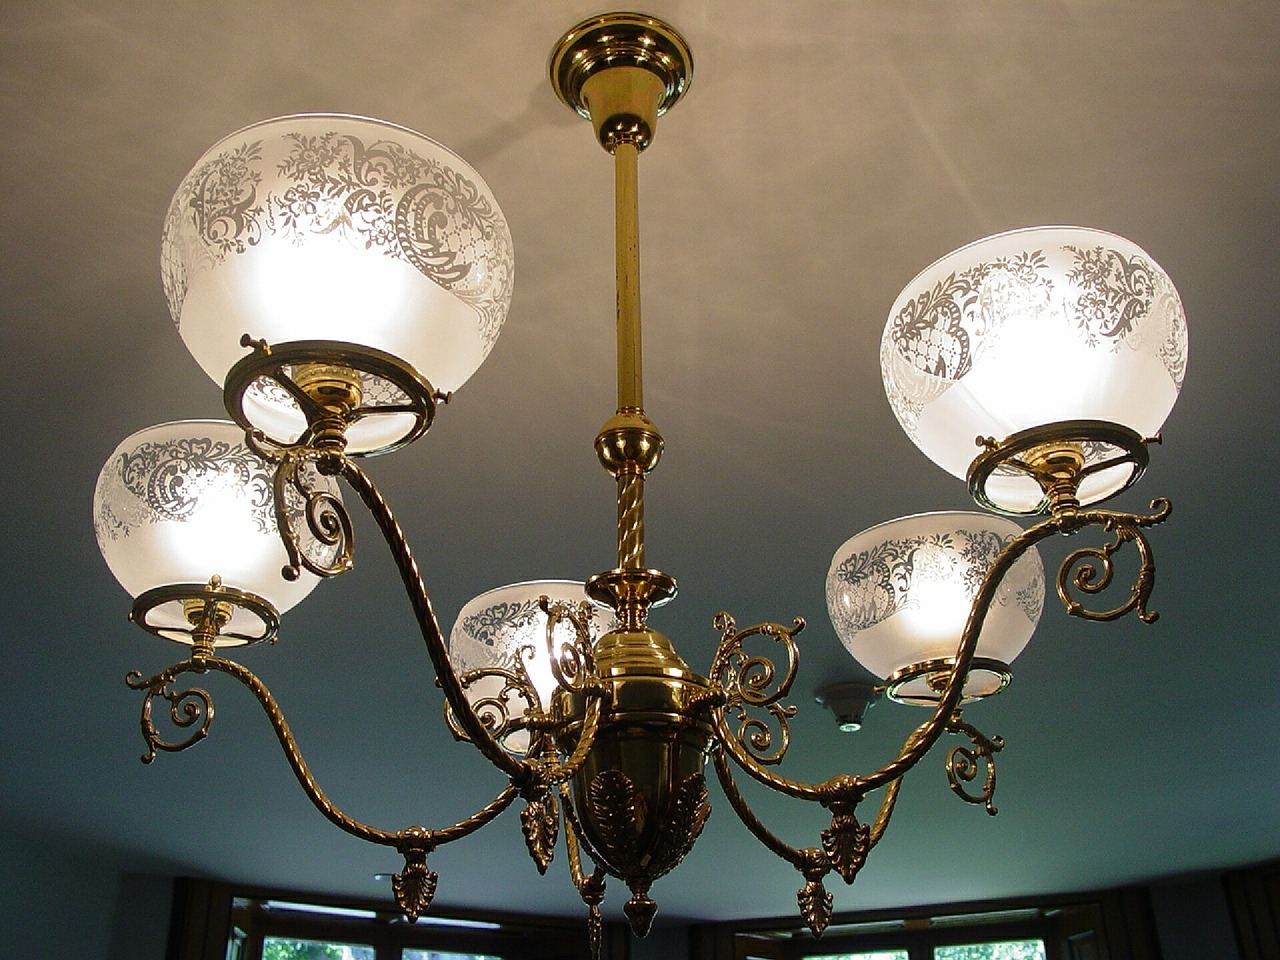 Lampadario Antico In Legno : Lampadari cucina ferro battuto lampadario bilancere rustico